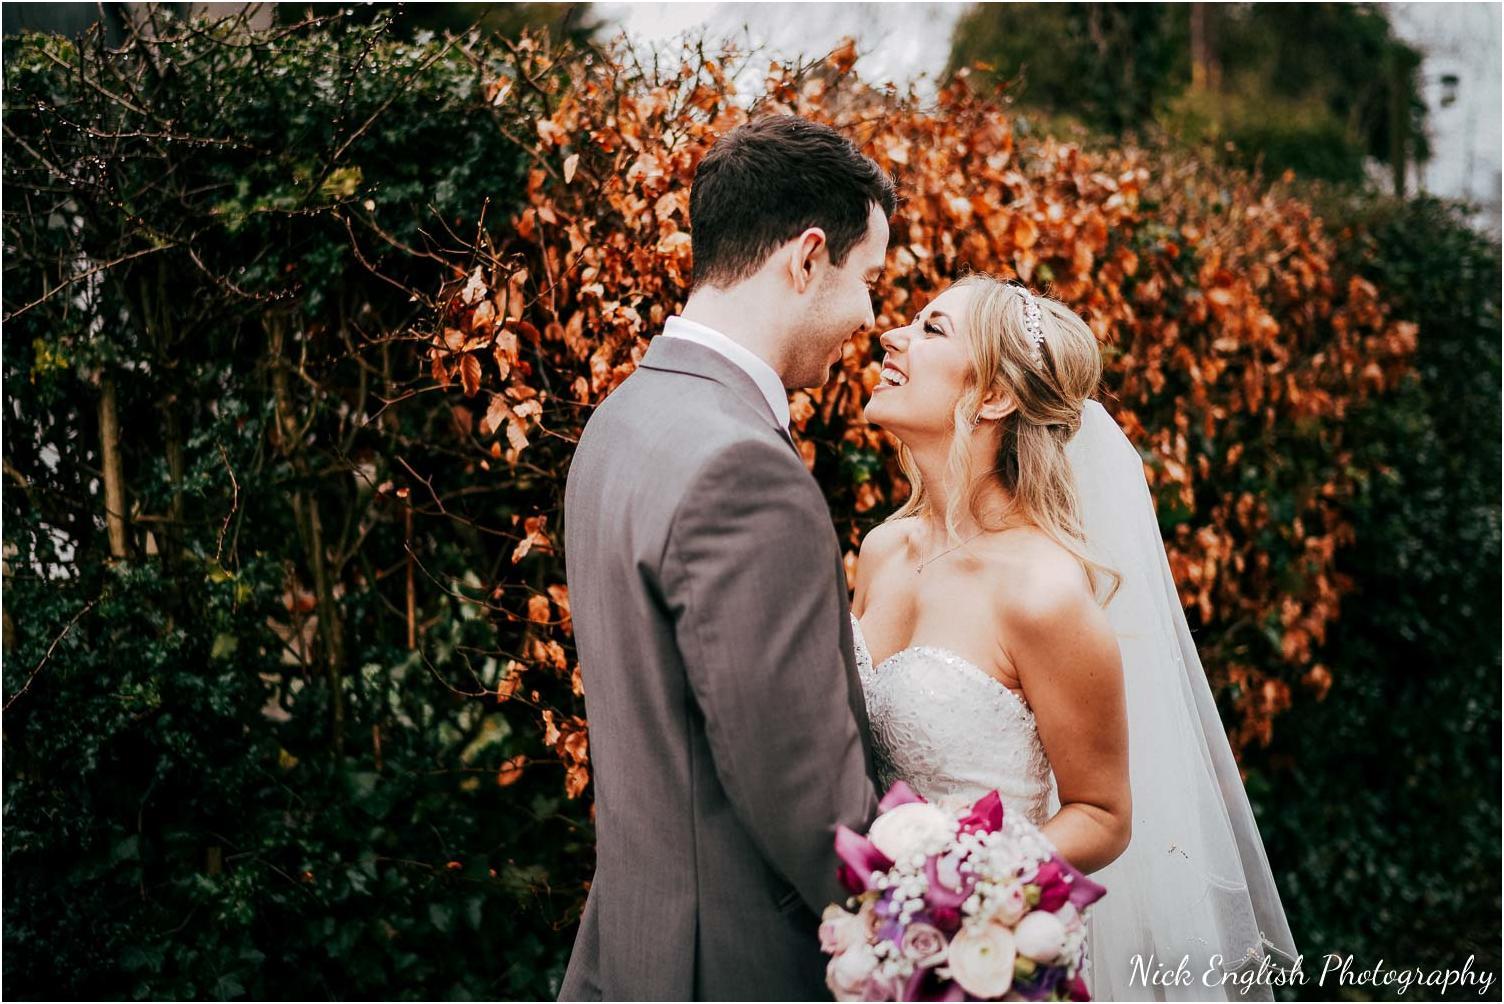 Mitton_Hall_Wedding_Photographer_2018-92.jpg